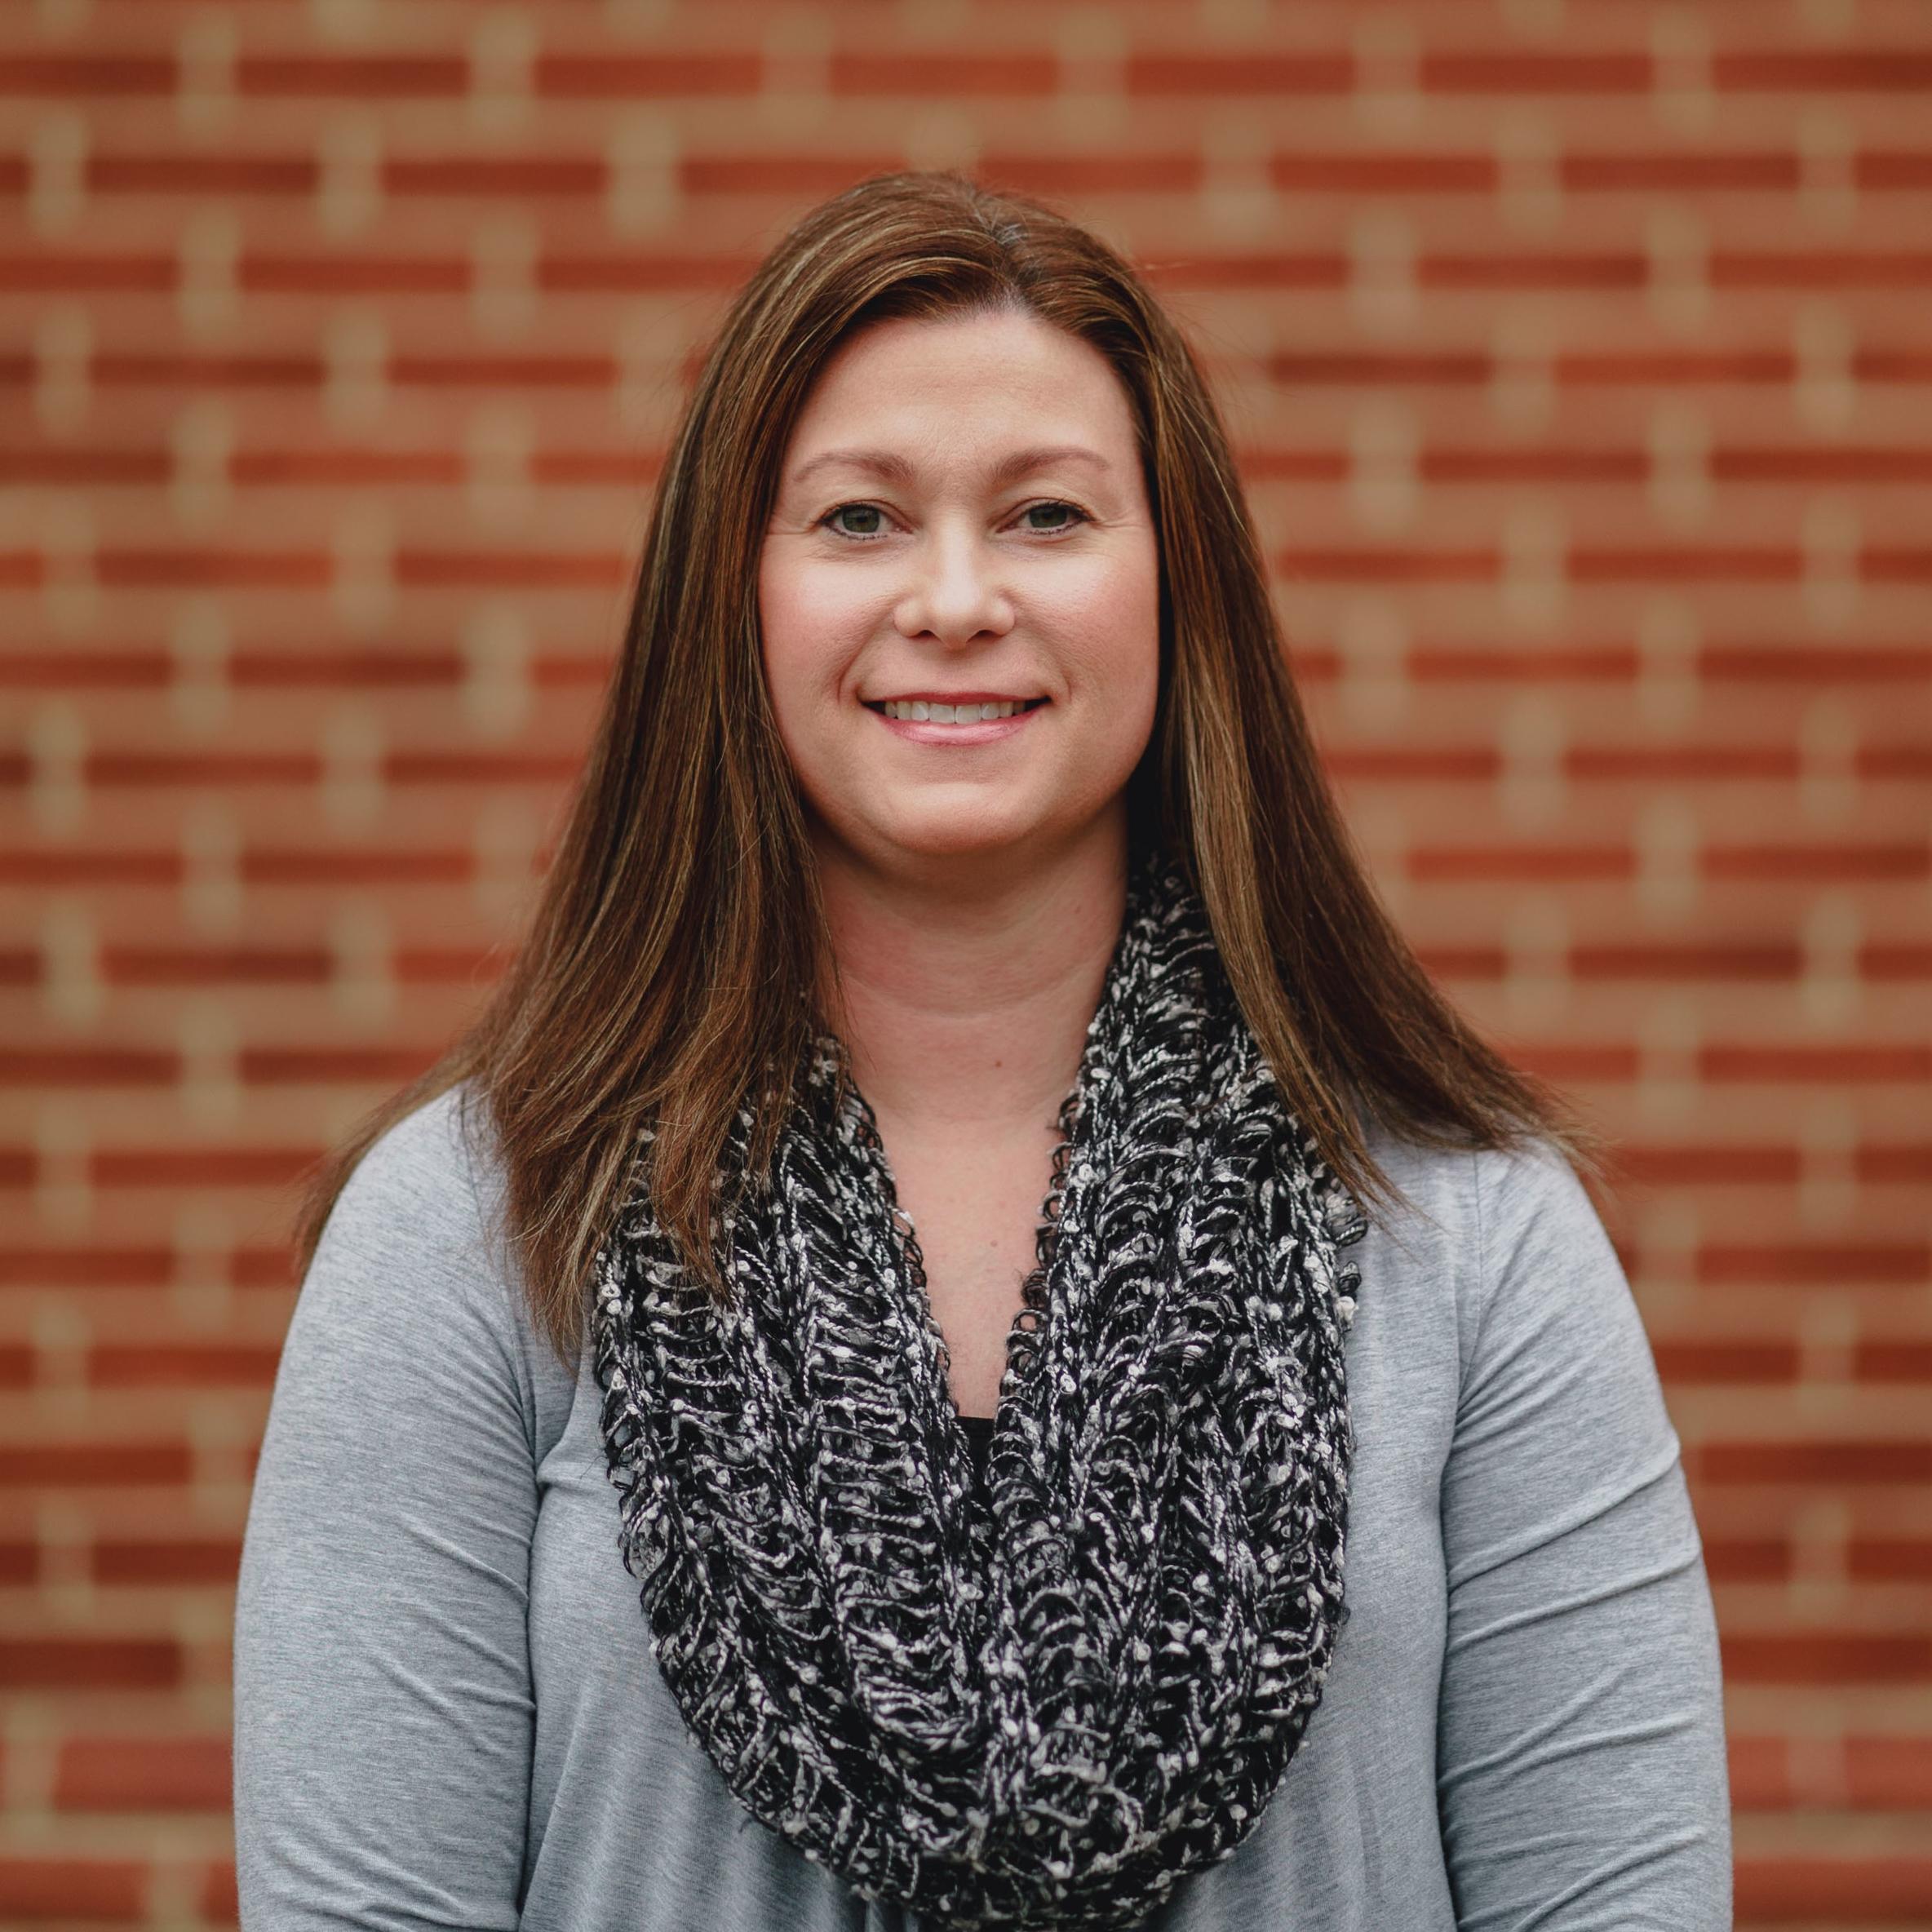 Tabitha Rogers Childcare Coordinator - trogers@fbcwoodbridge.org